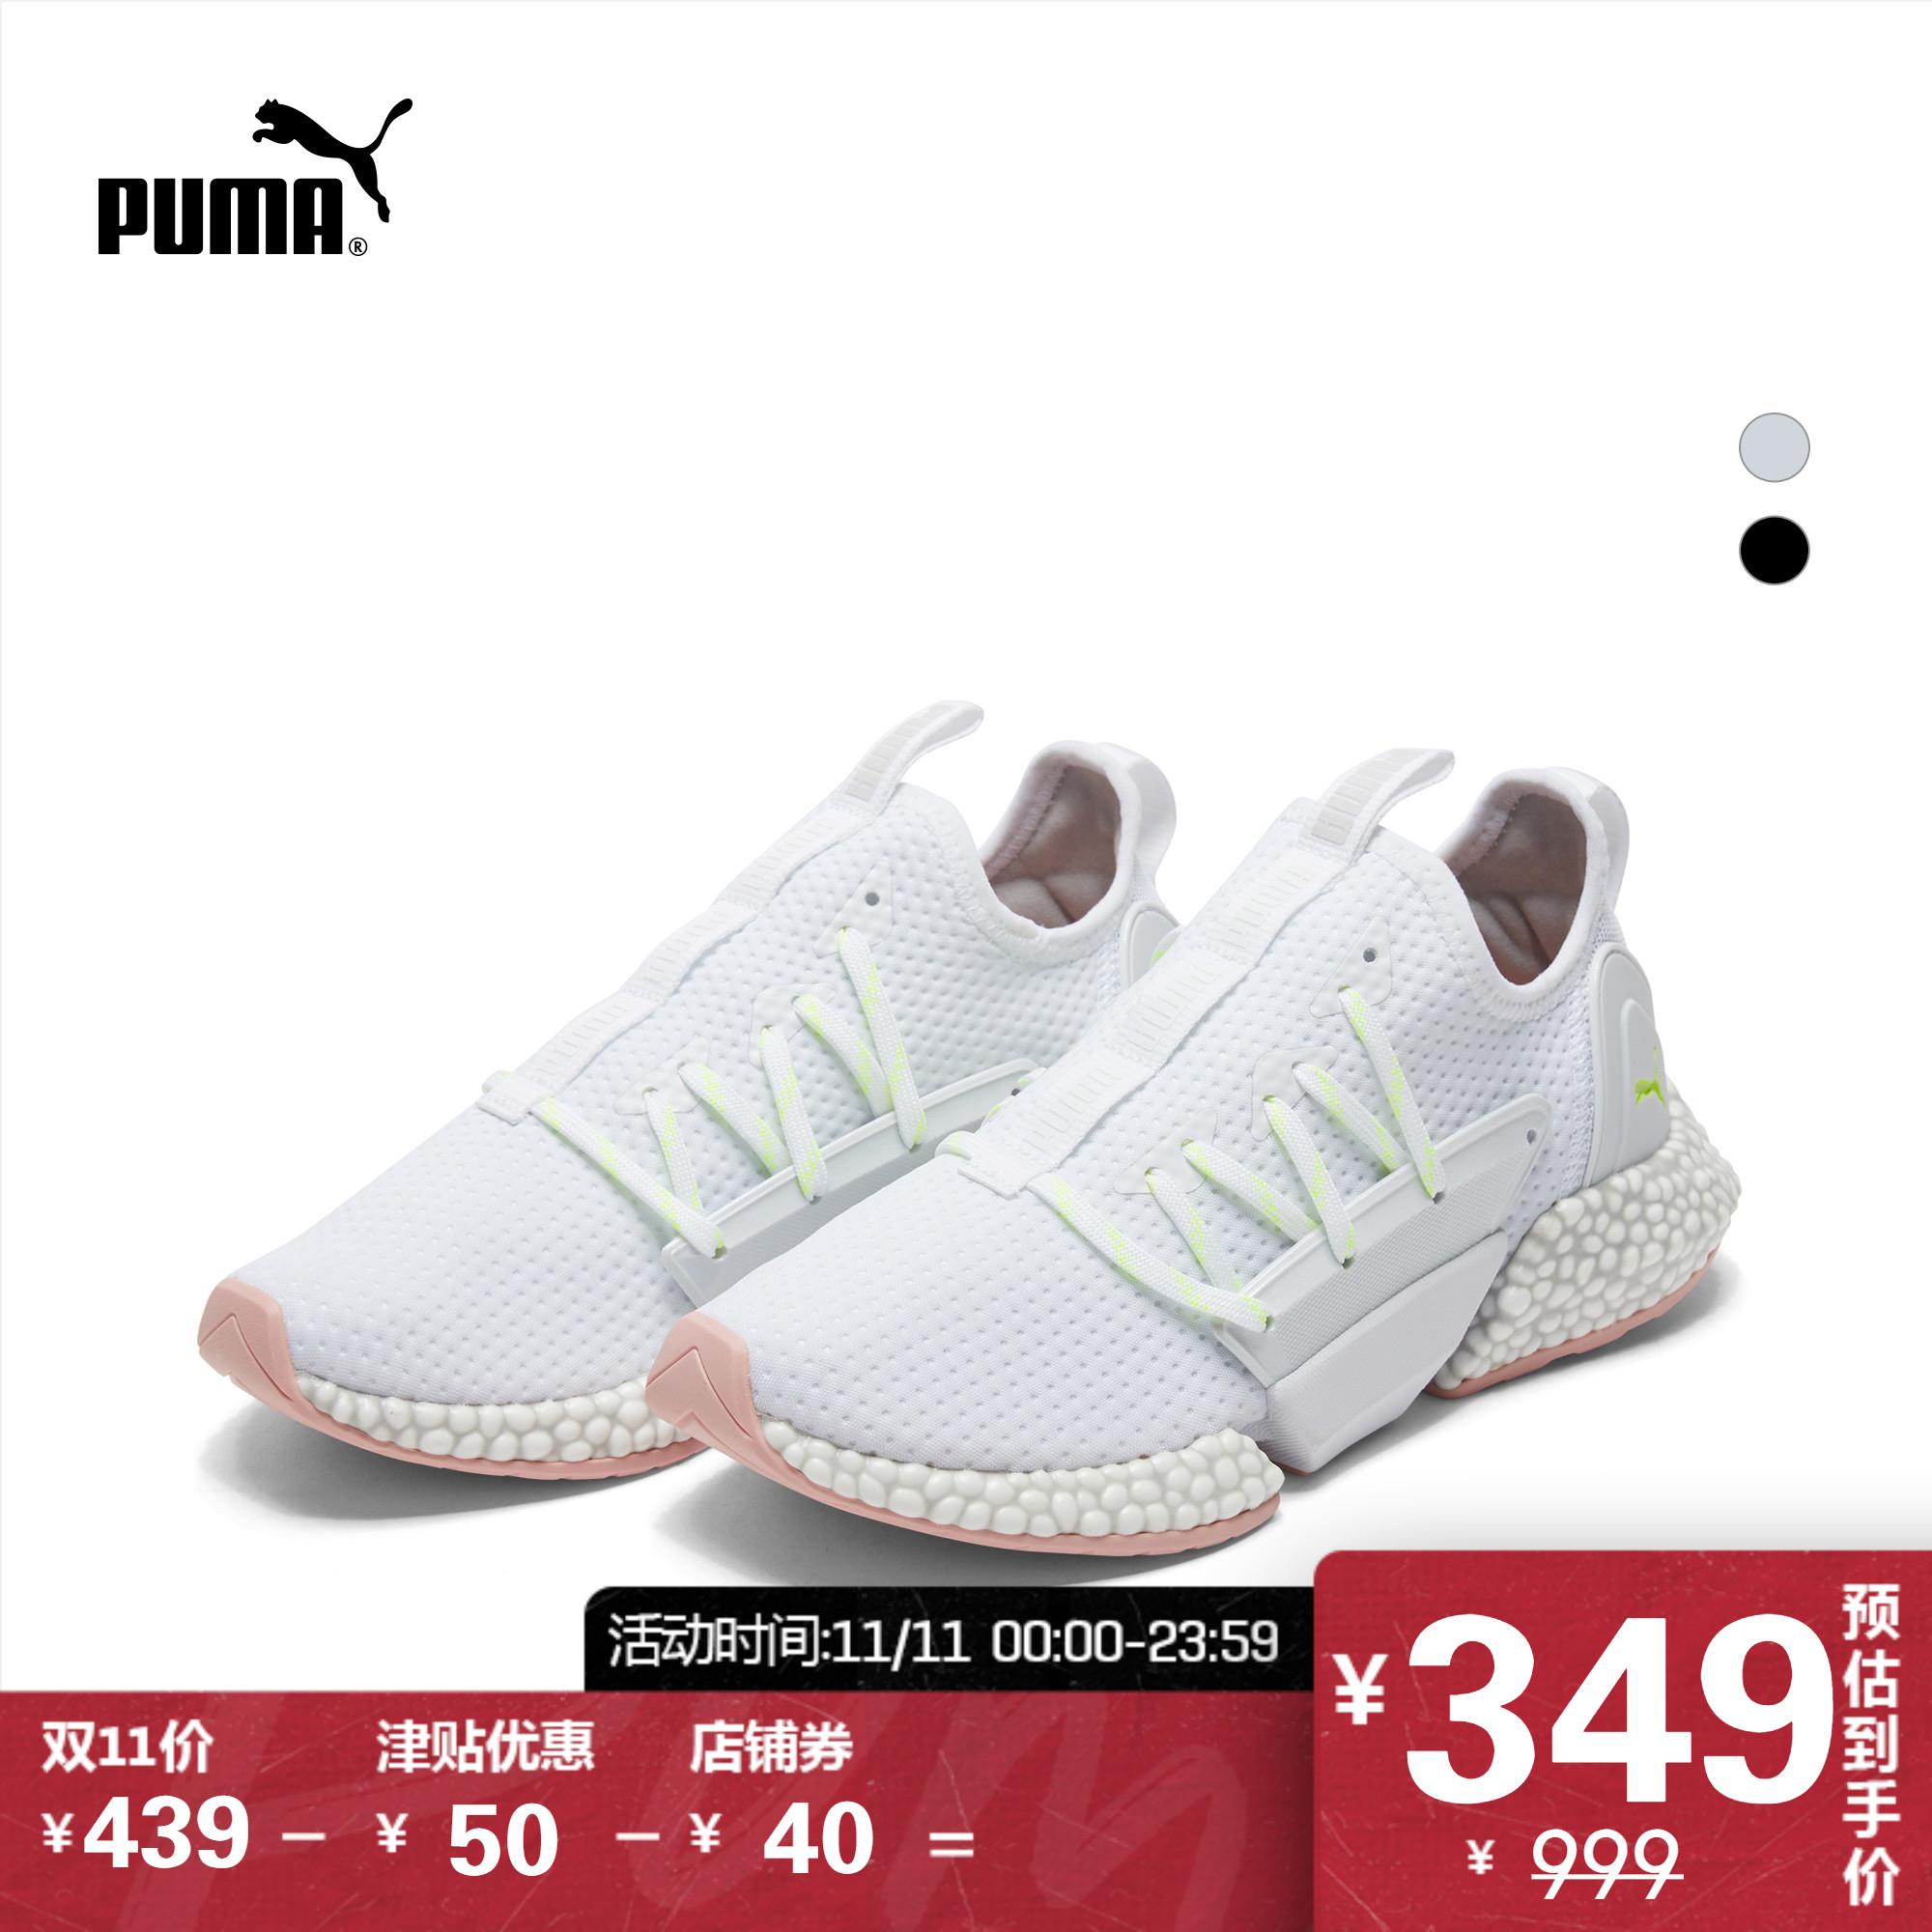 PUMA彪马官方正品 新款女子训练健身跑步鞋 HYBRID ROCKET 192573